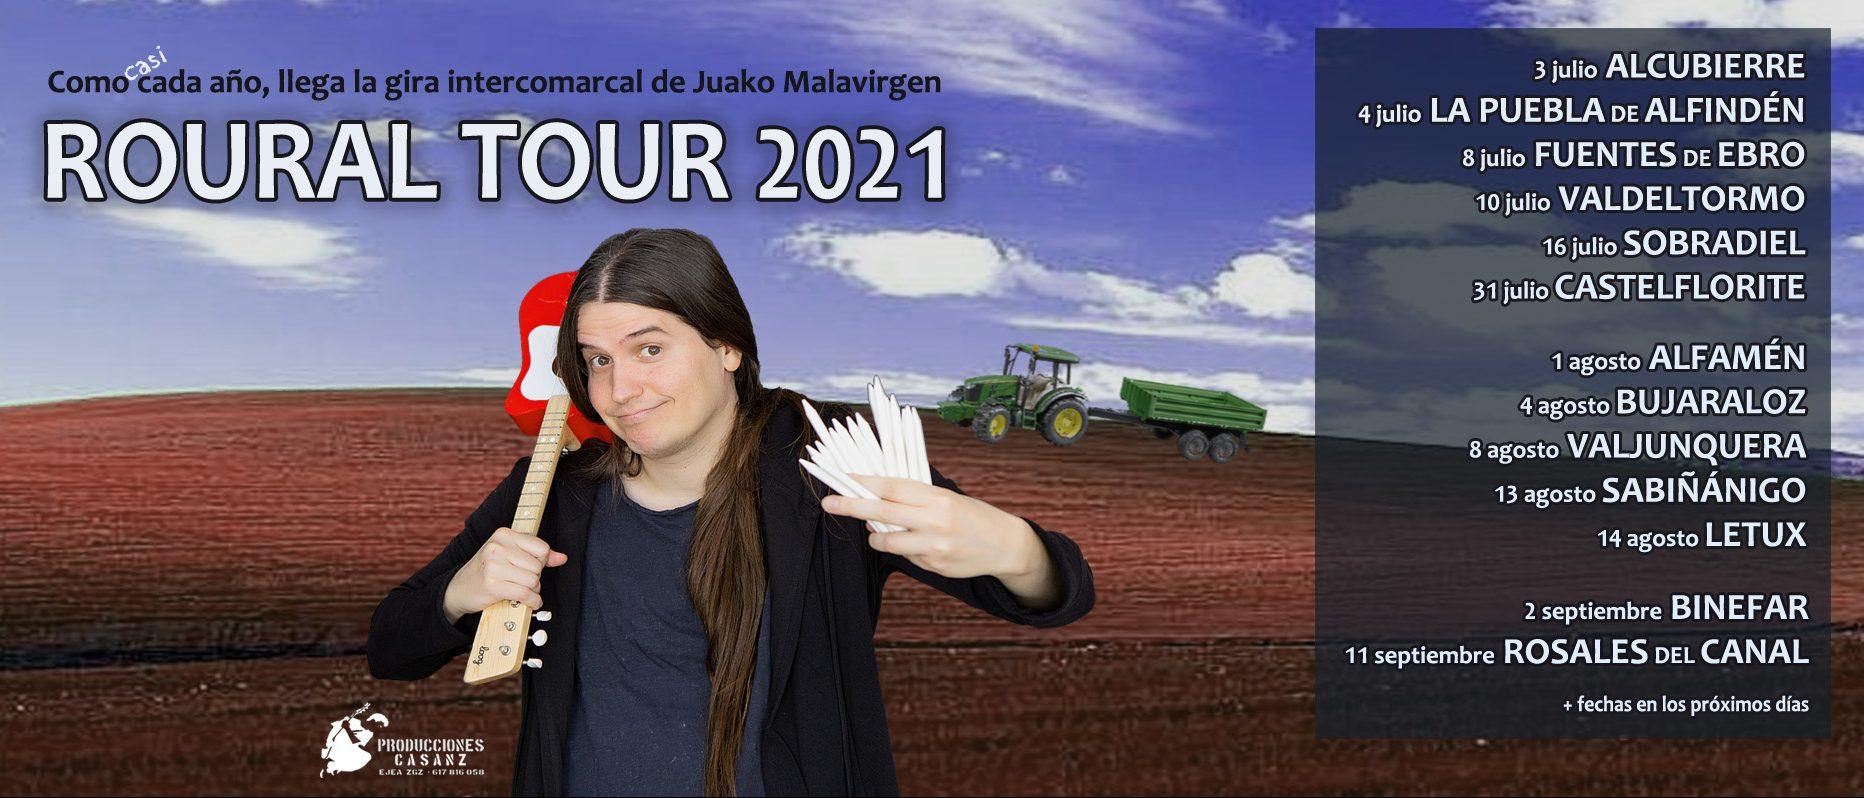 Agenda de verano de Juako Malavirgen